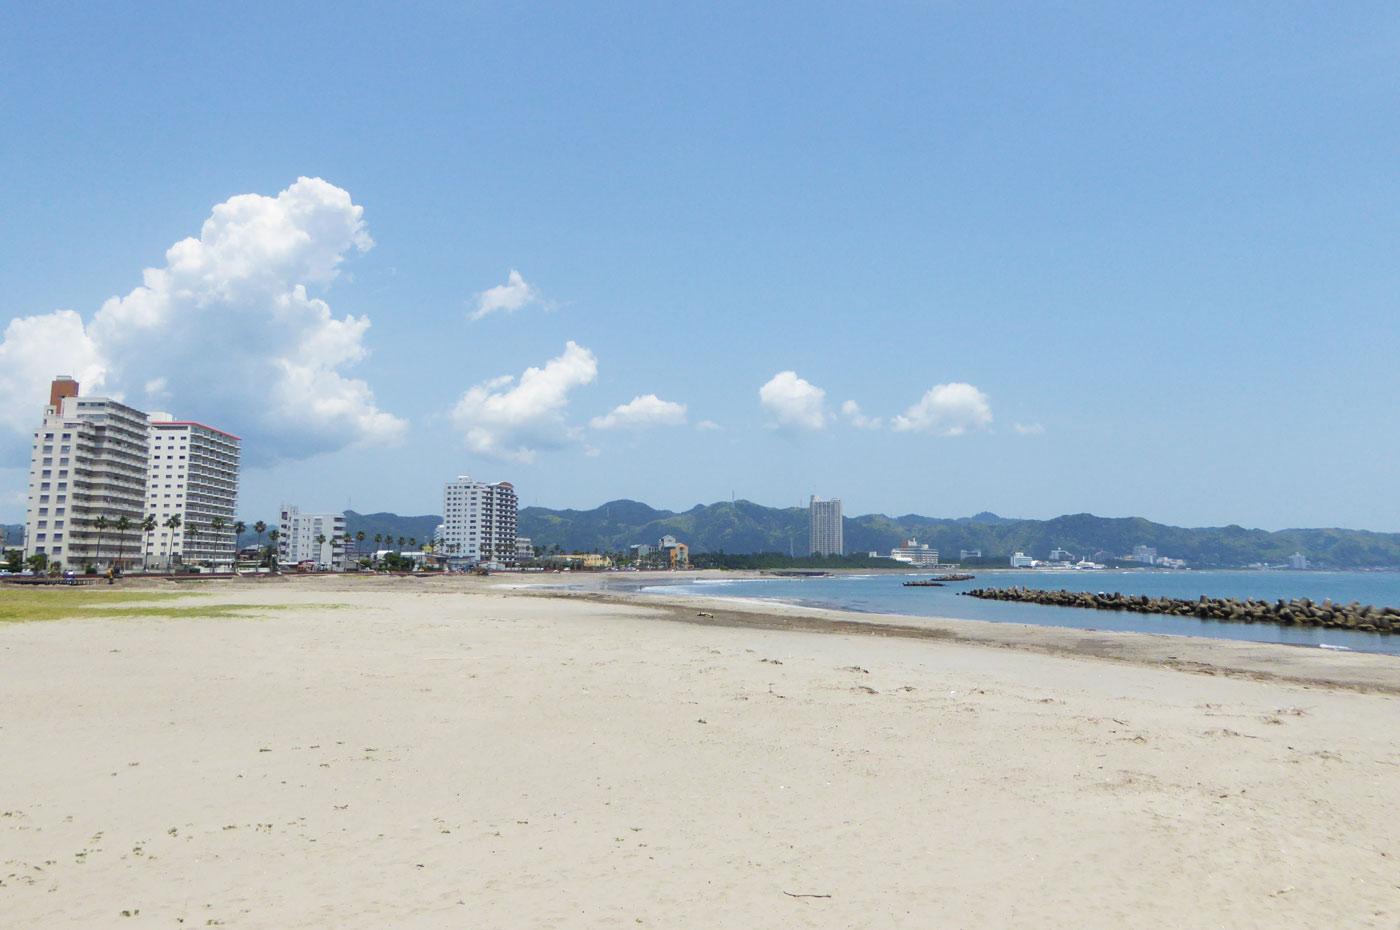 前原横渚海水浴場の白い砂浜